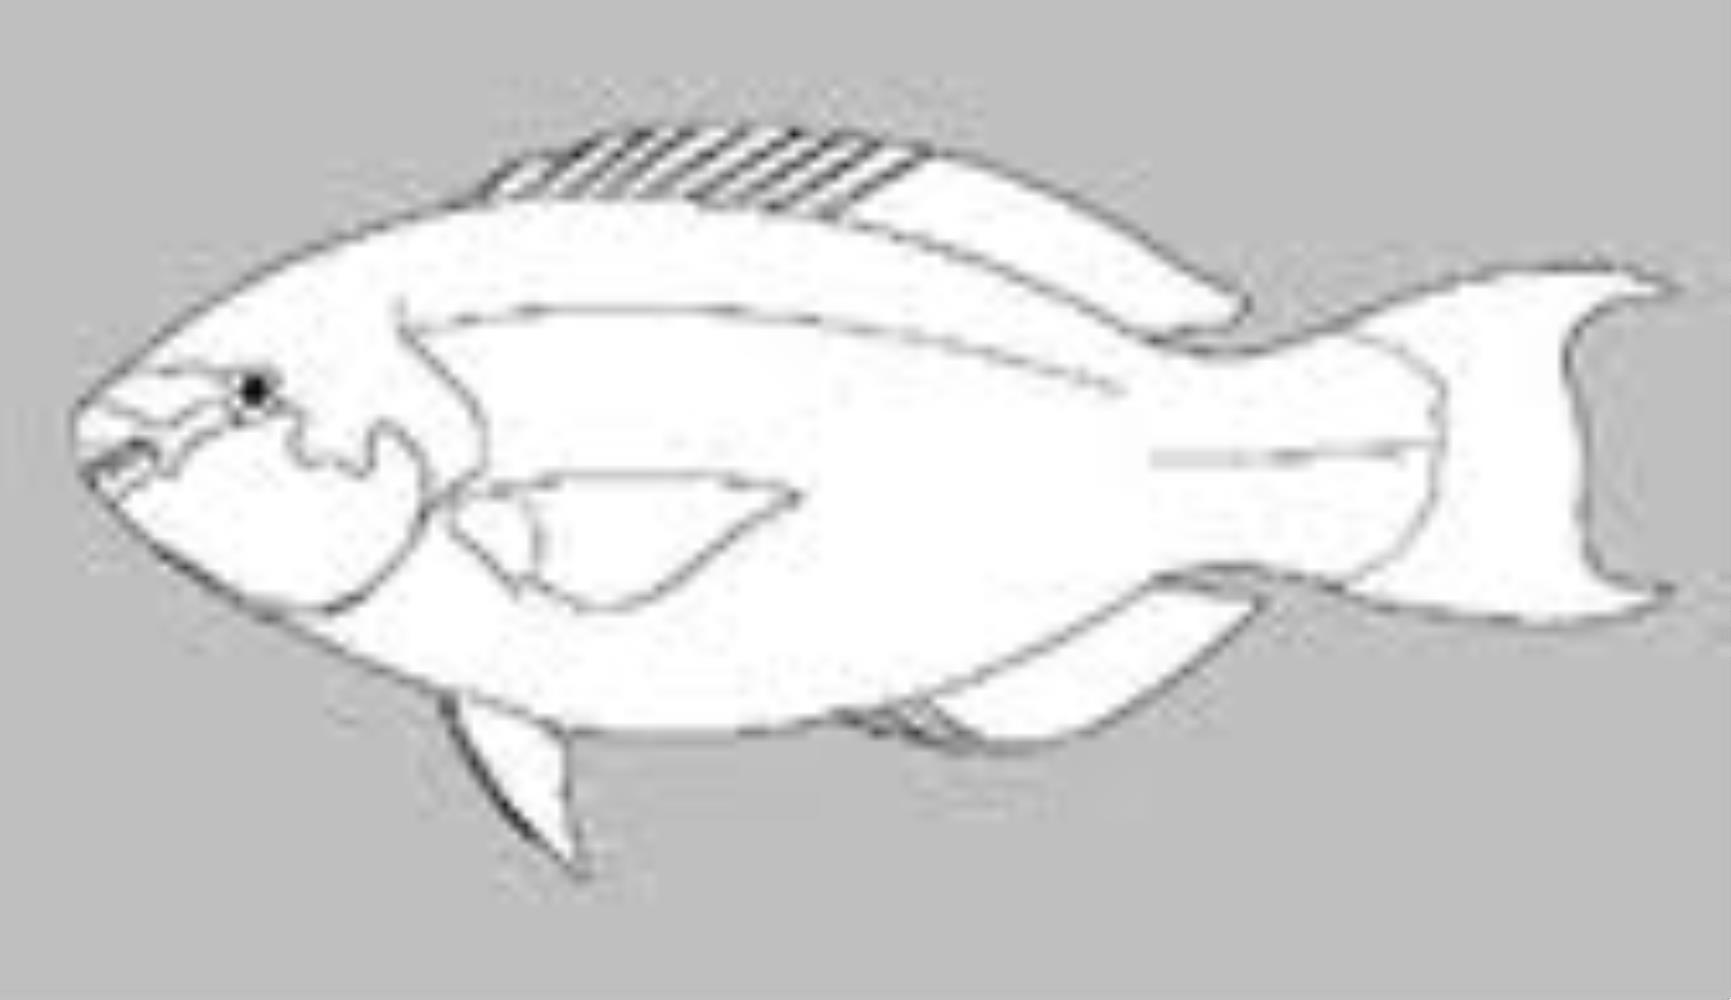 Sparisoma griseorubrum